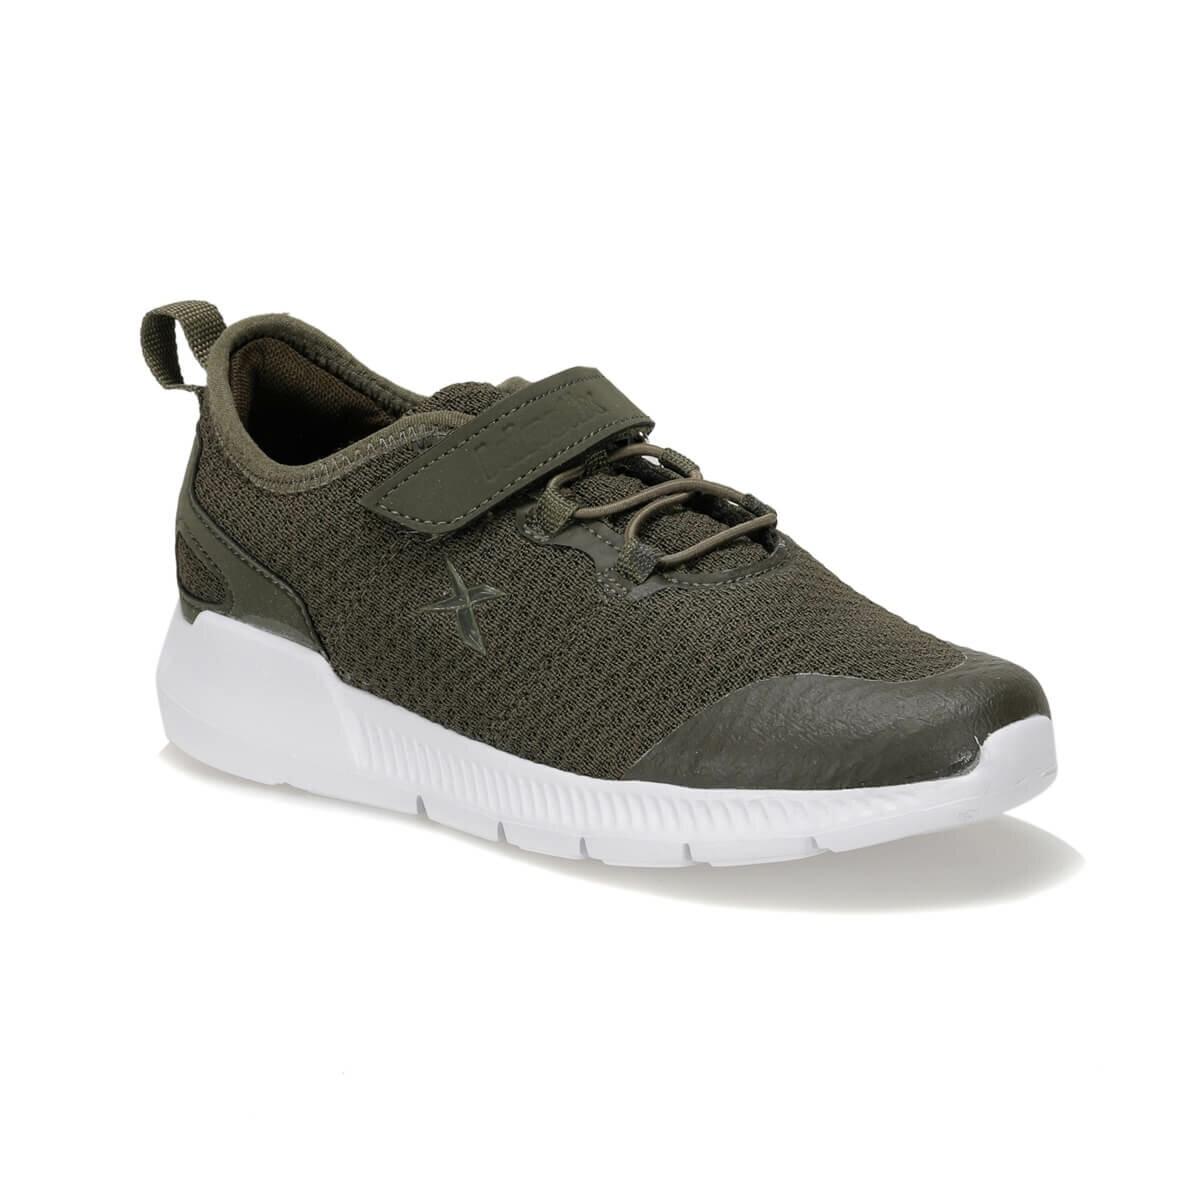 FLO LAZER J Khaki Male Child Hiking Shoes KINETIX